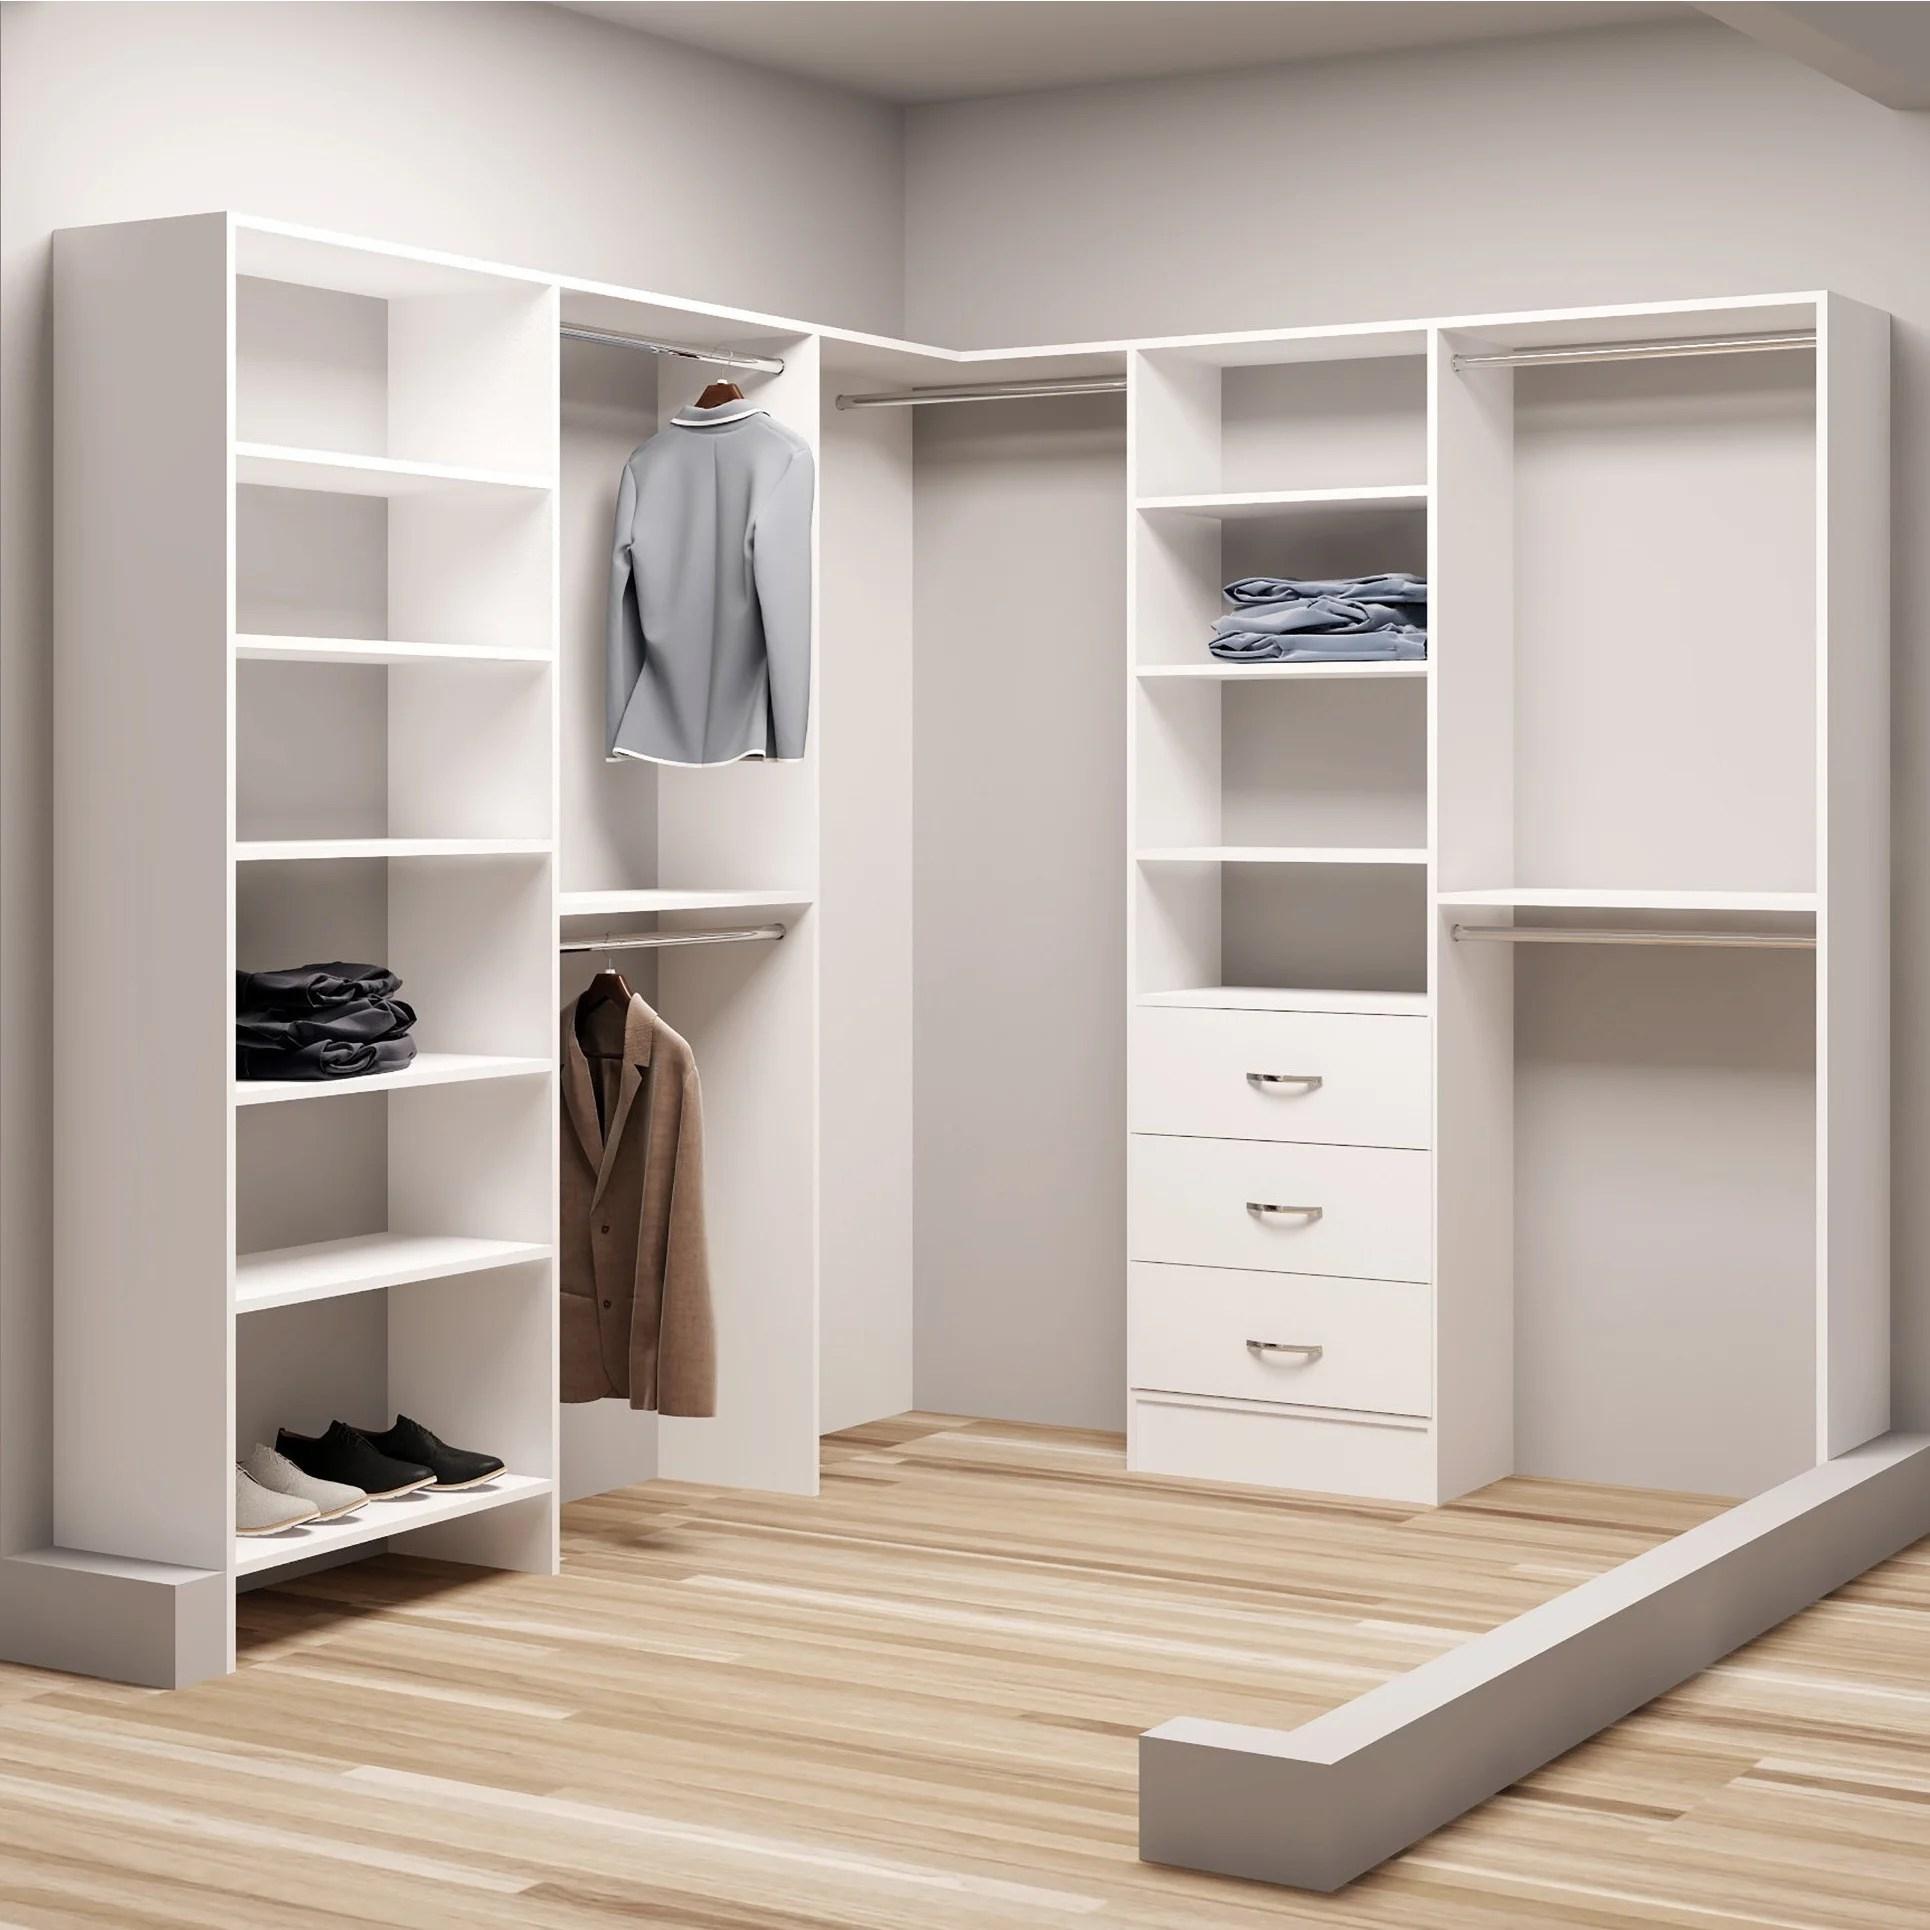 Tidysquares White Wood 81 X 102 25 Walk In Closet System